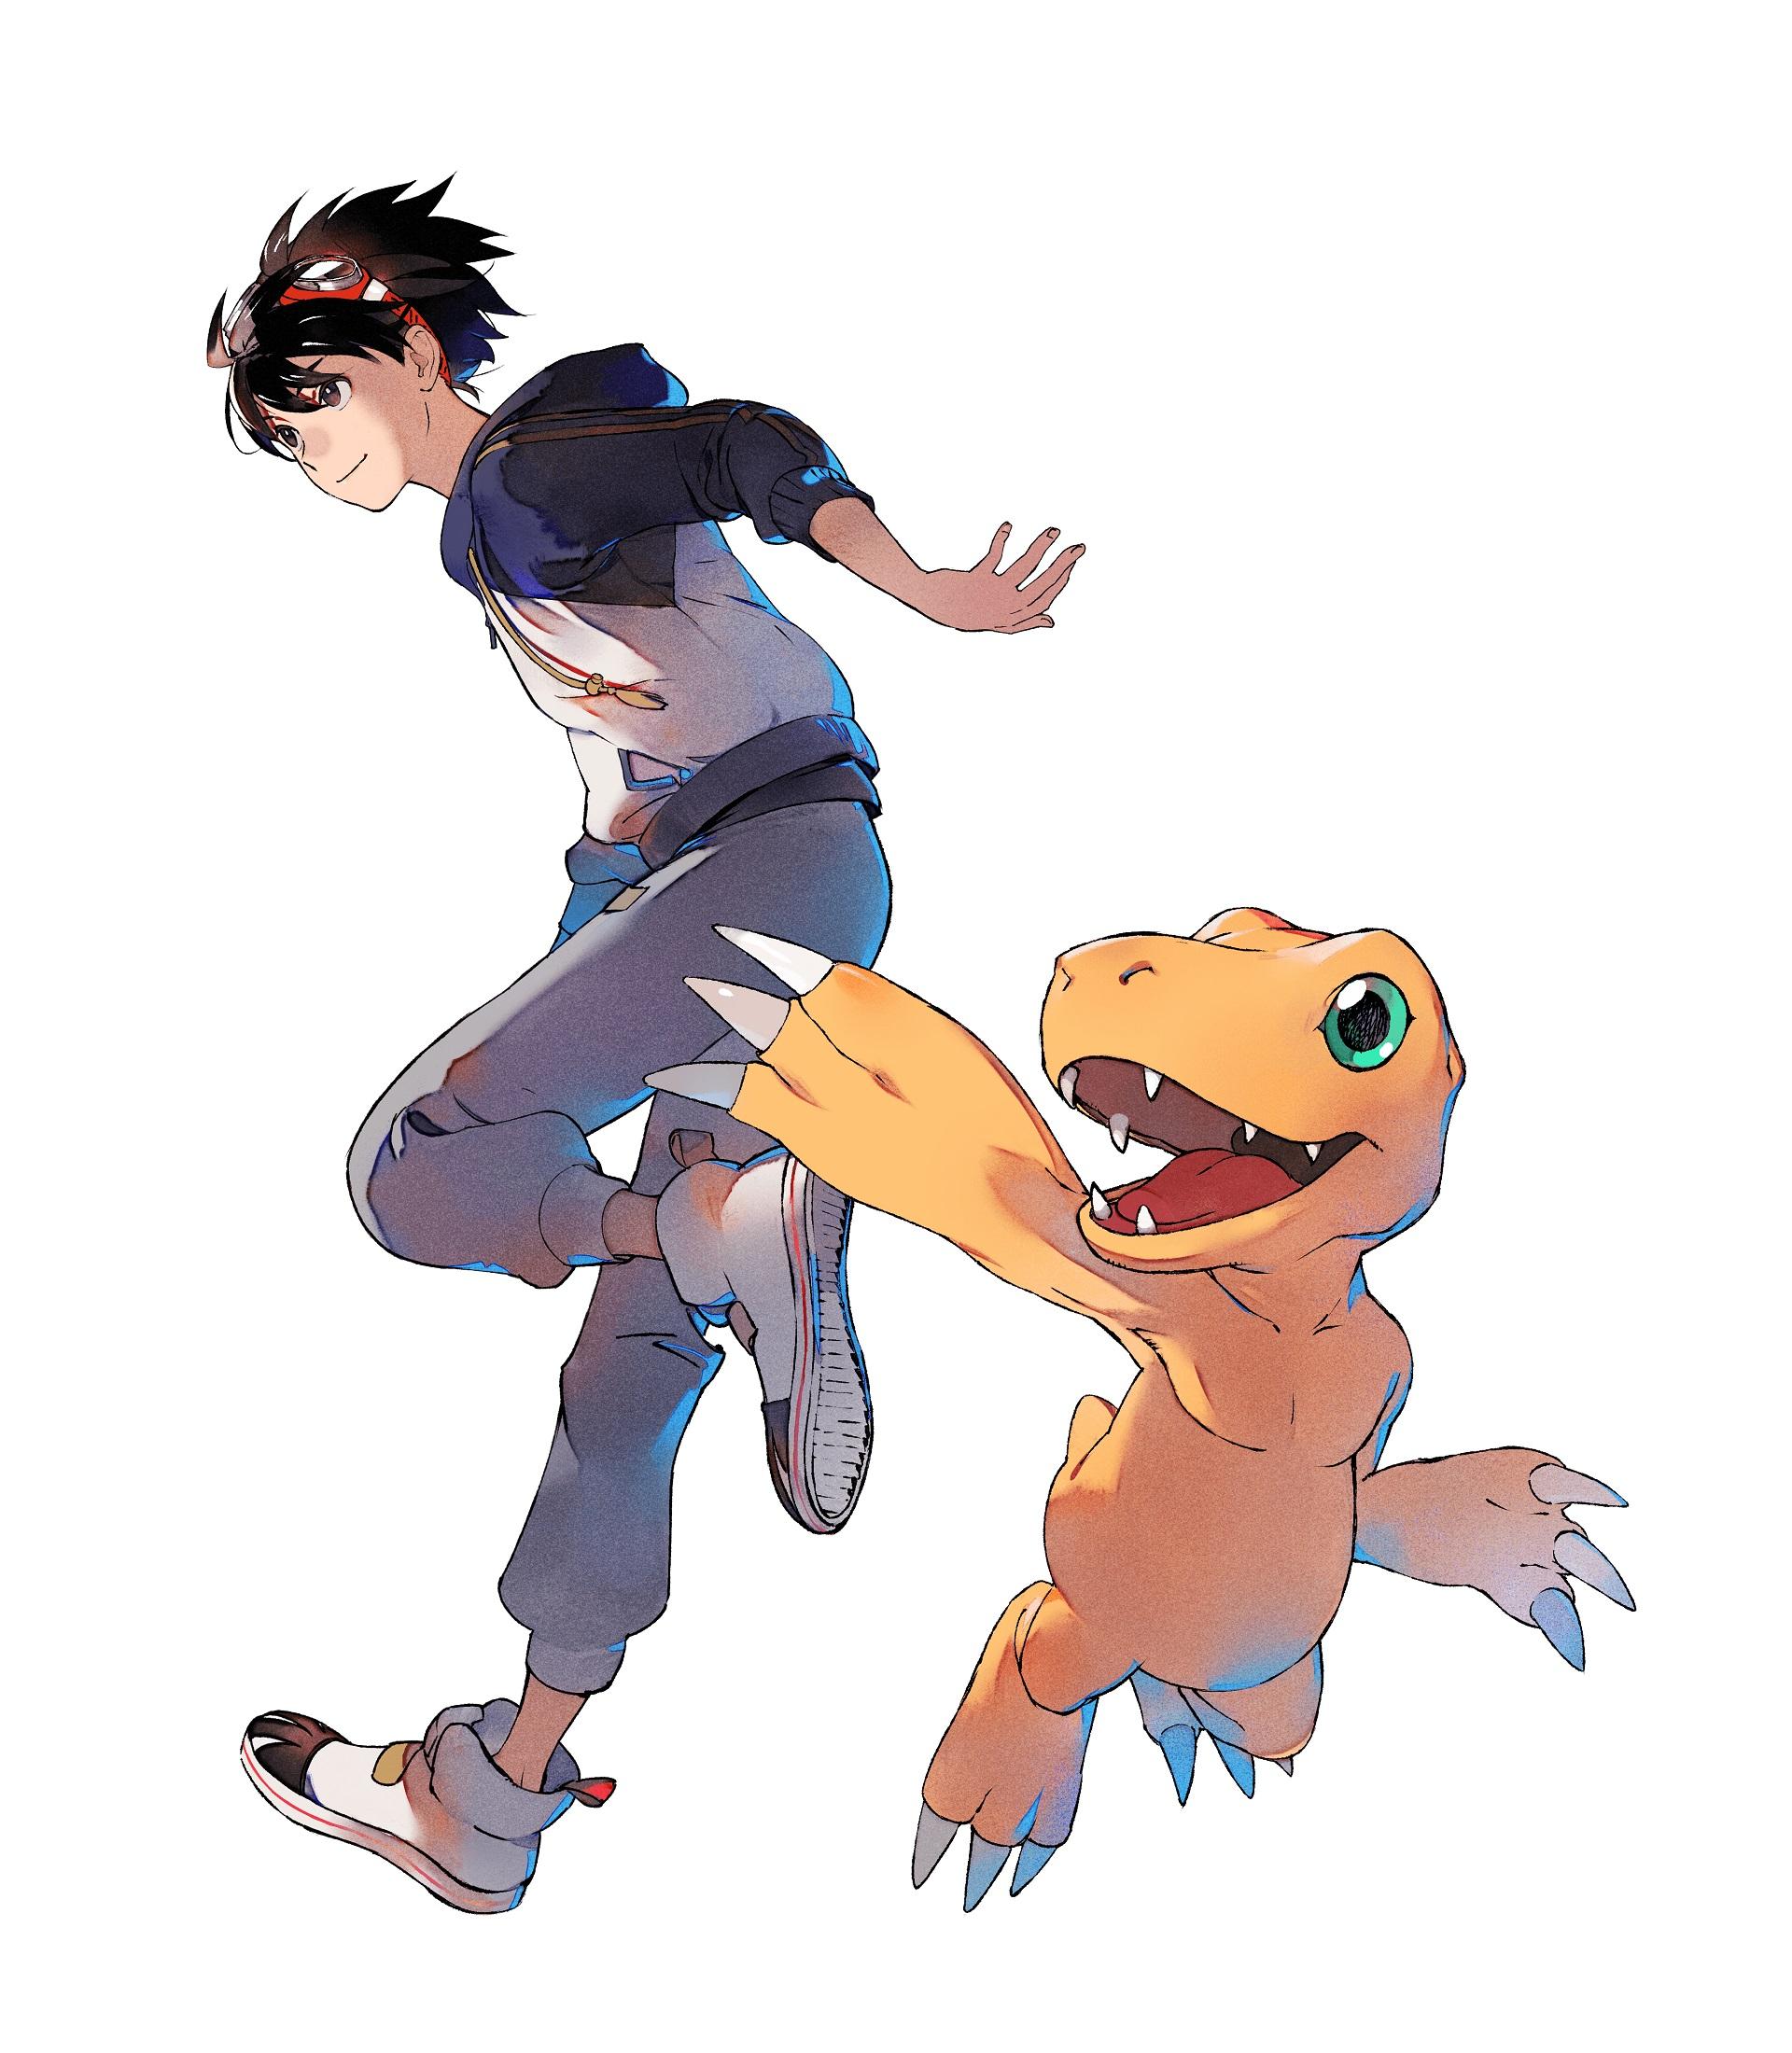 Digimon Survive: Takuma & Agumon